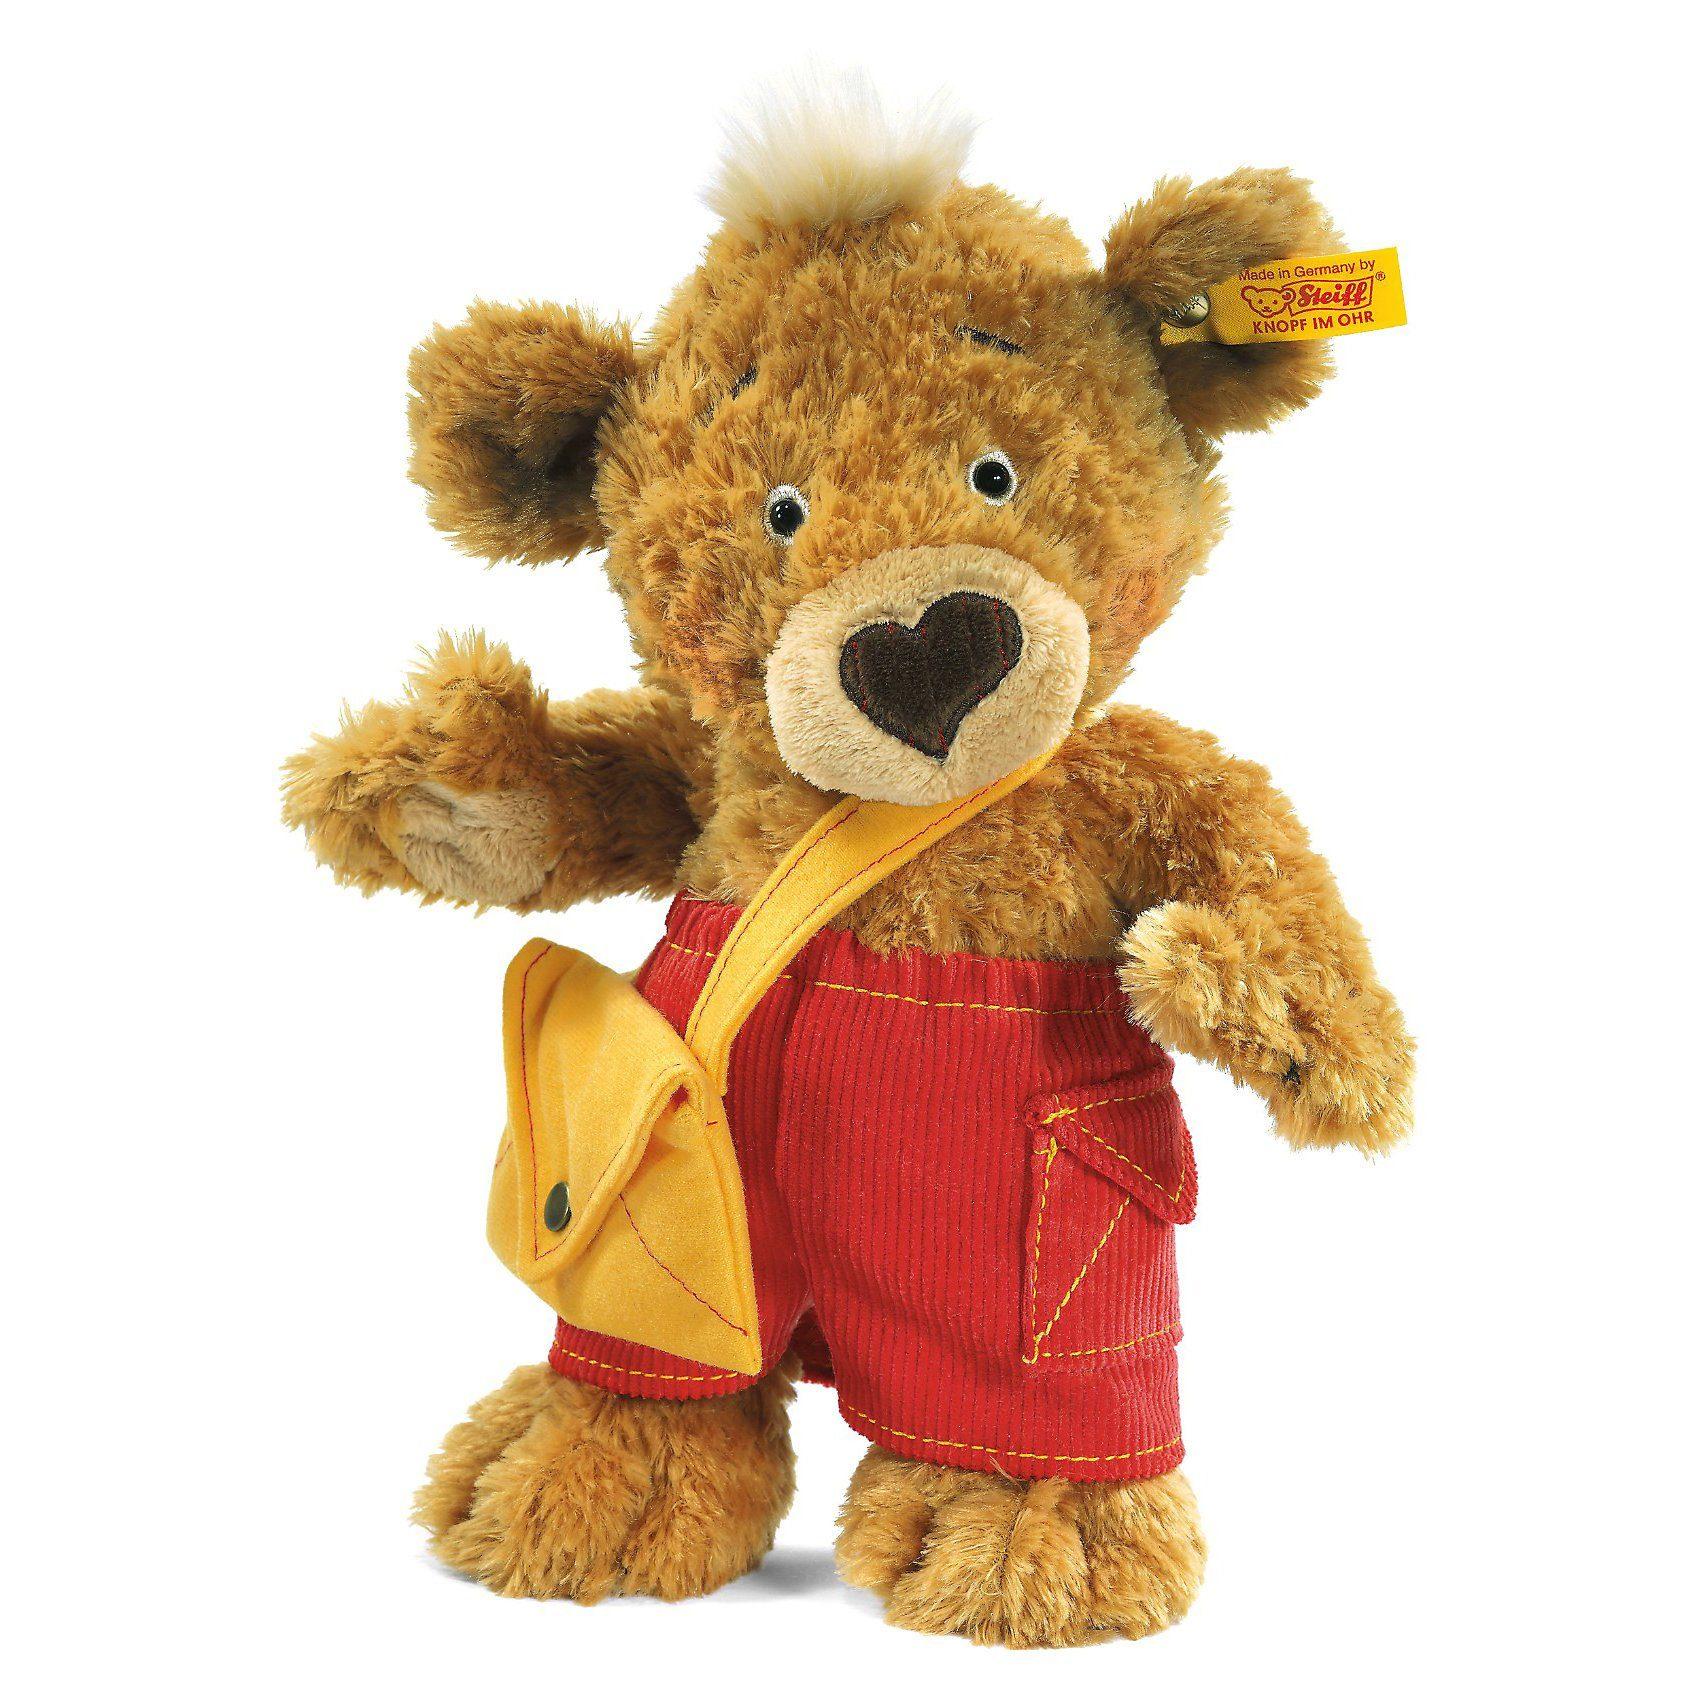 Steiff Knopf Teddybär 25 cm hellbraun